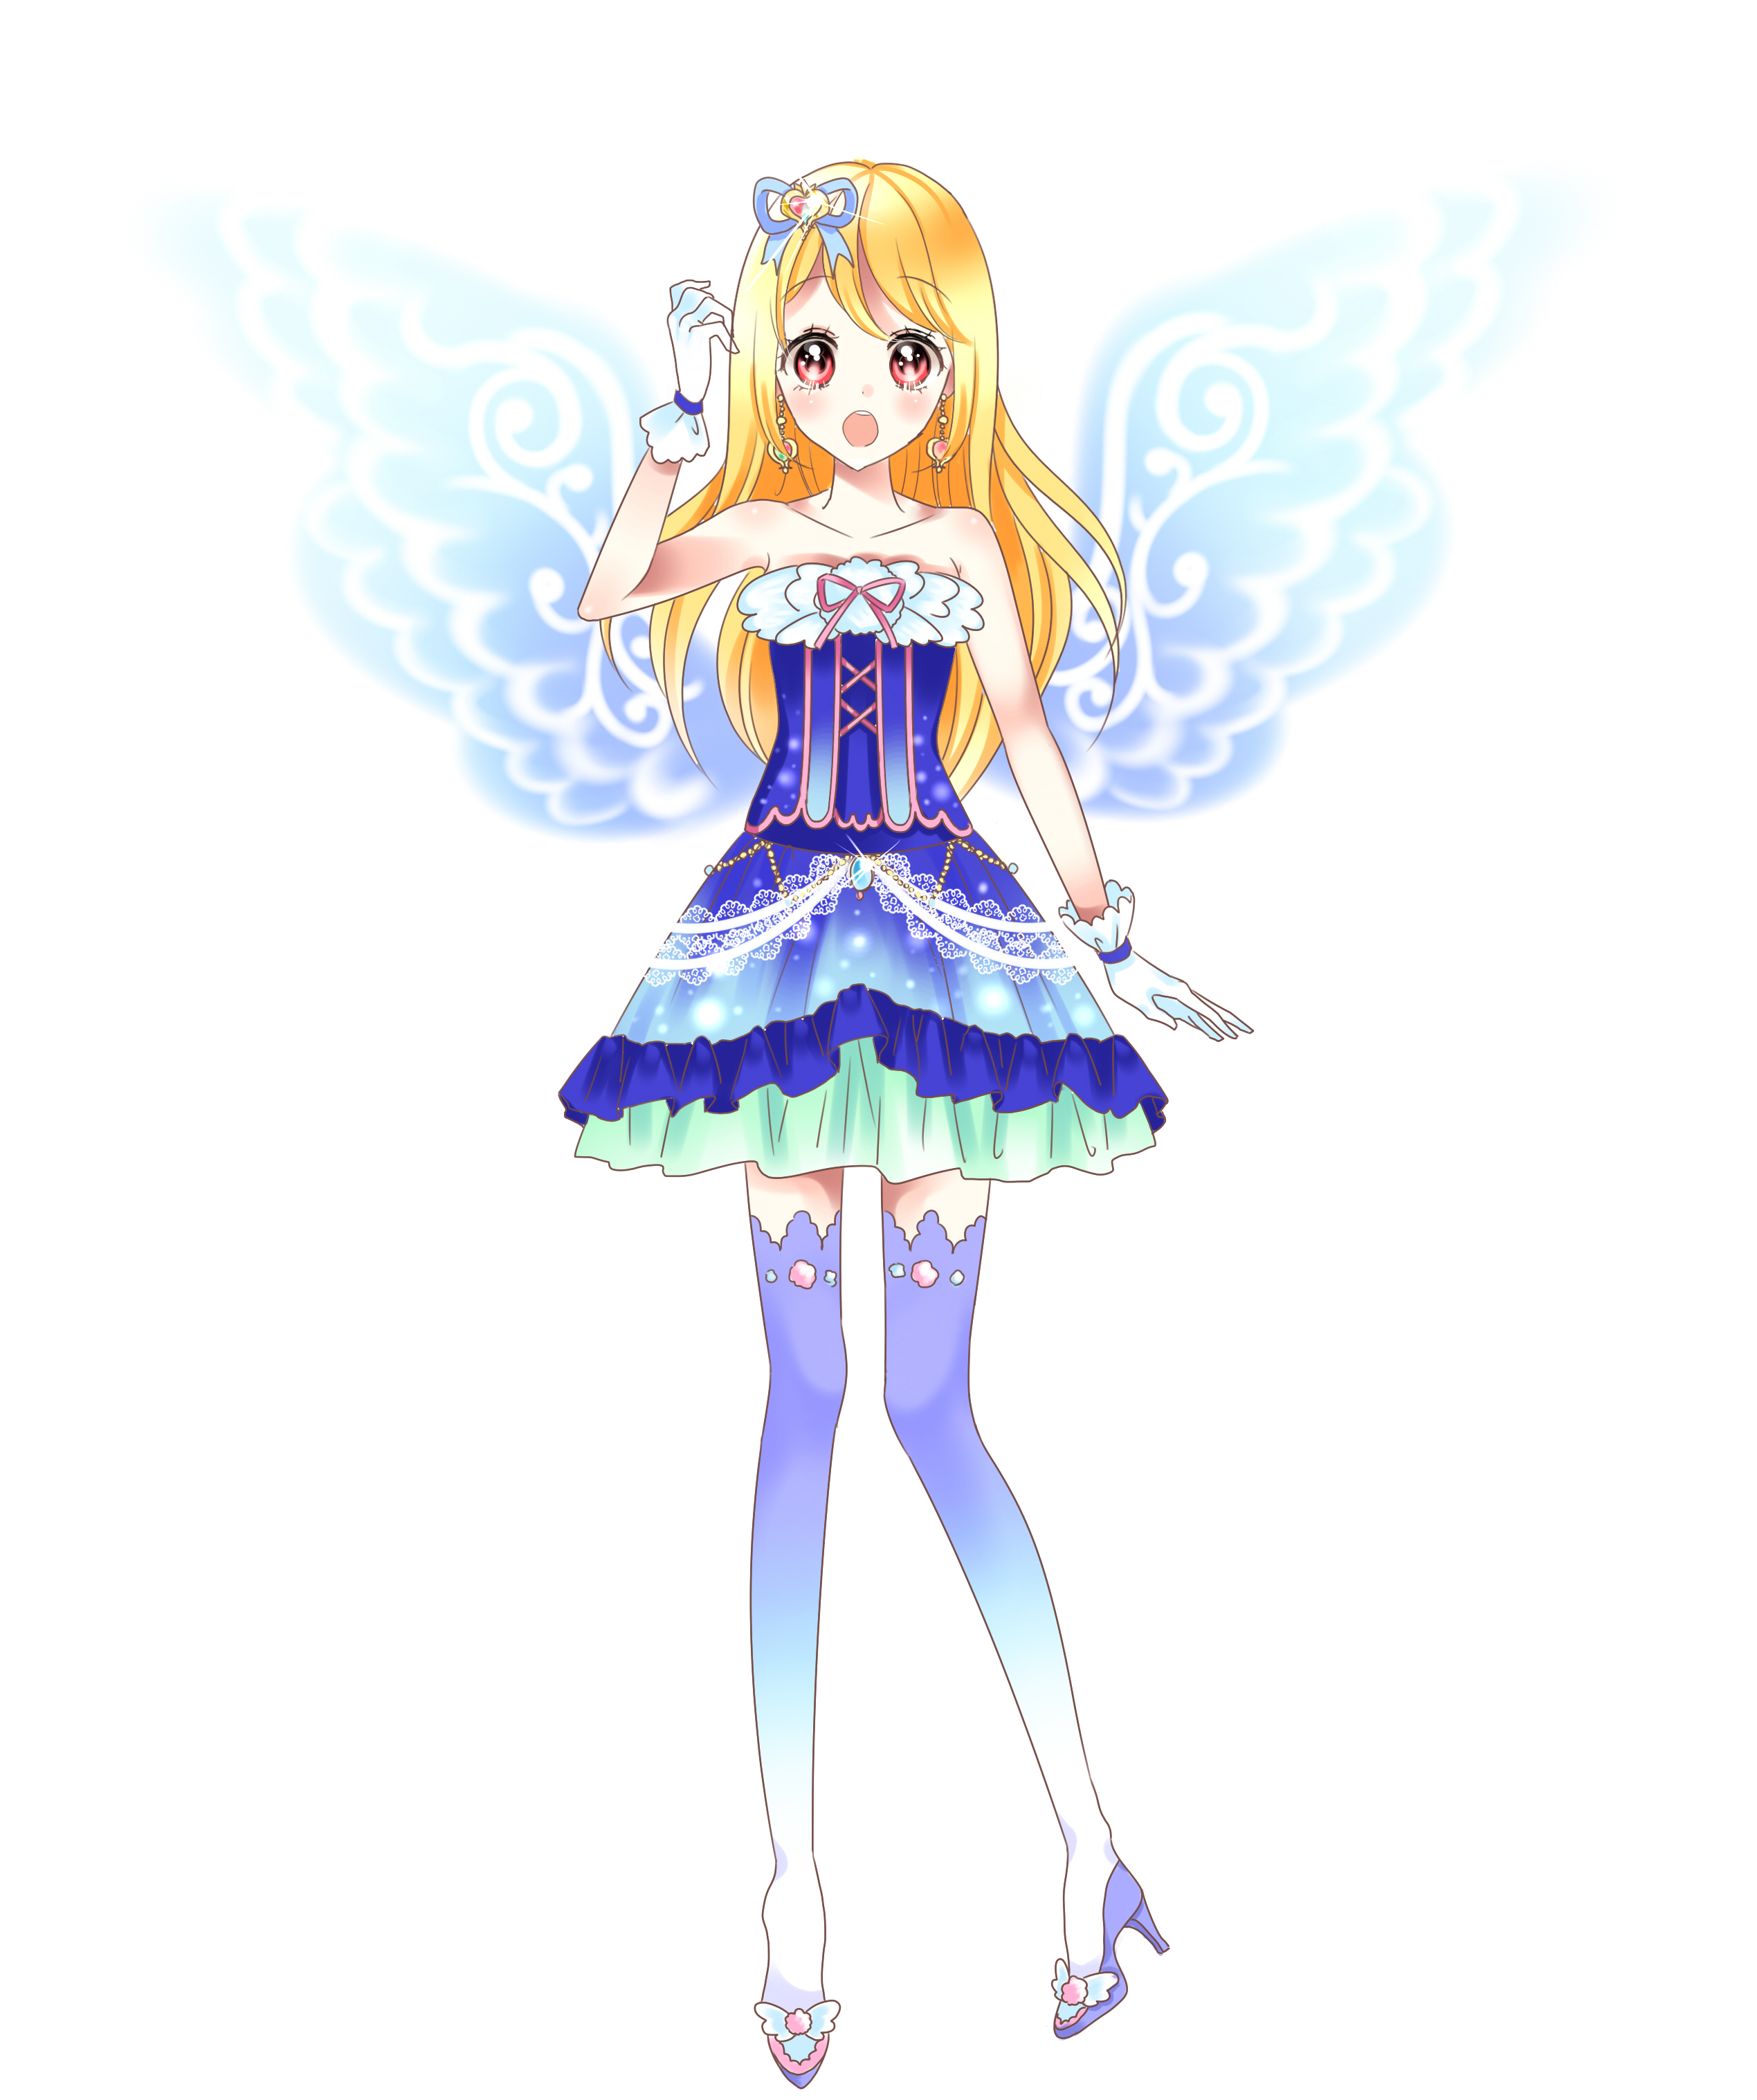 Blue short dresses